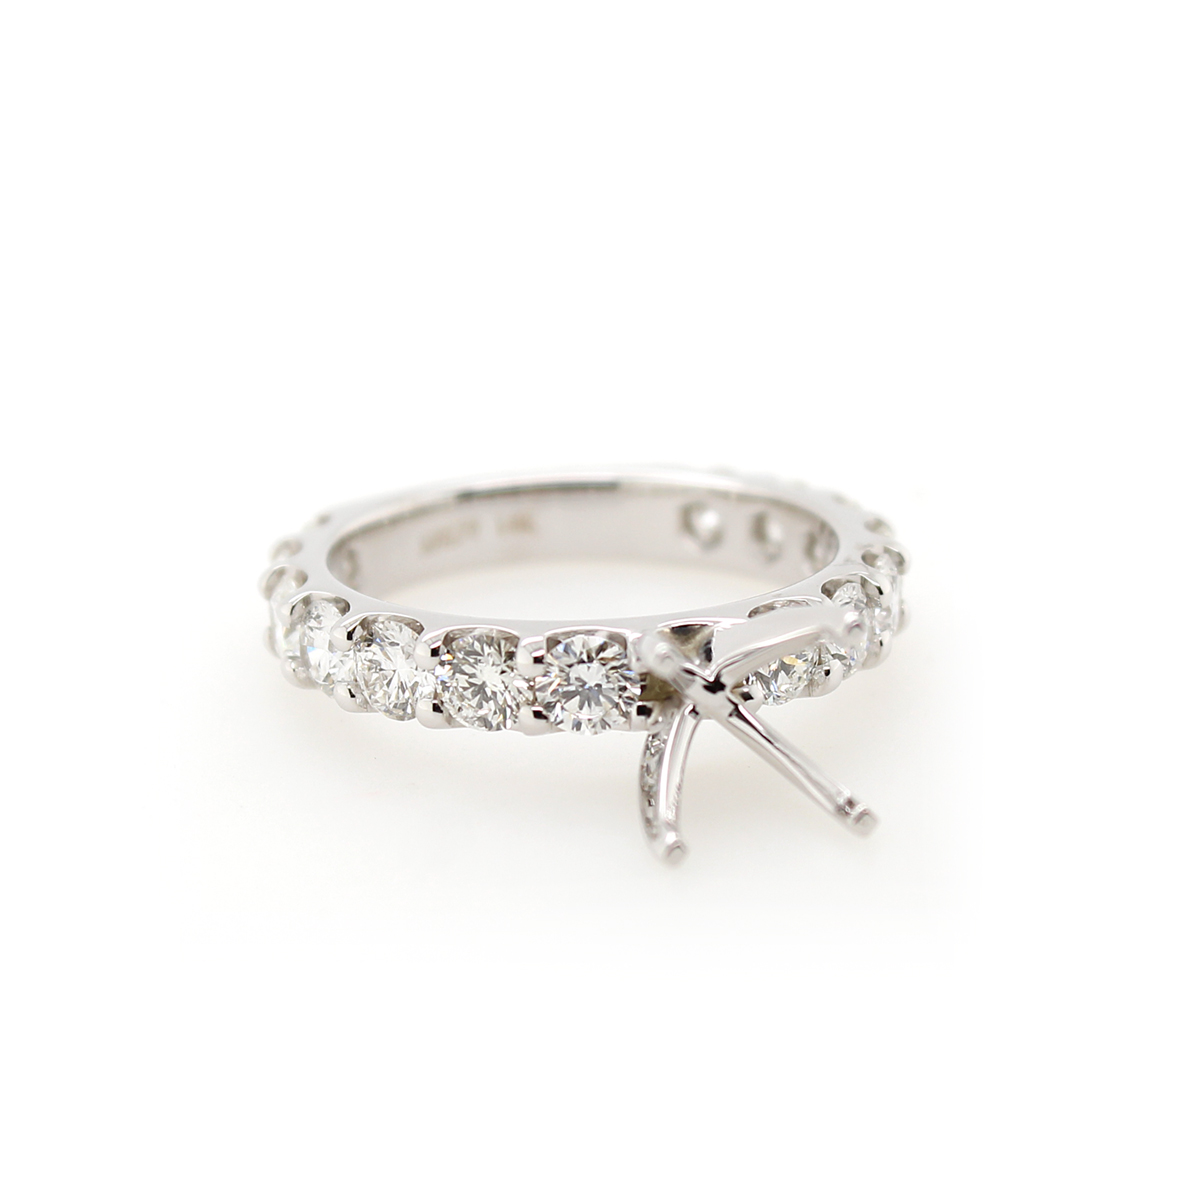 Shefi Diamonds 14 Karat White Gold Diamond Semi-Mount Engagement Ring